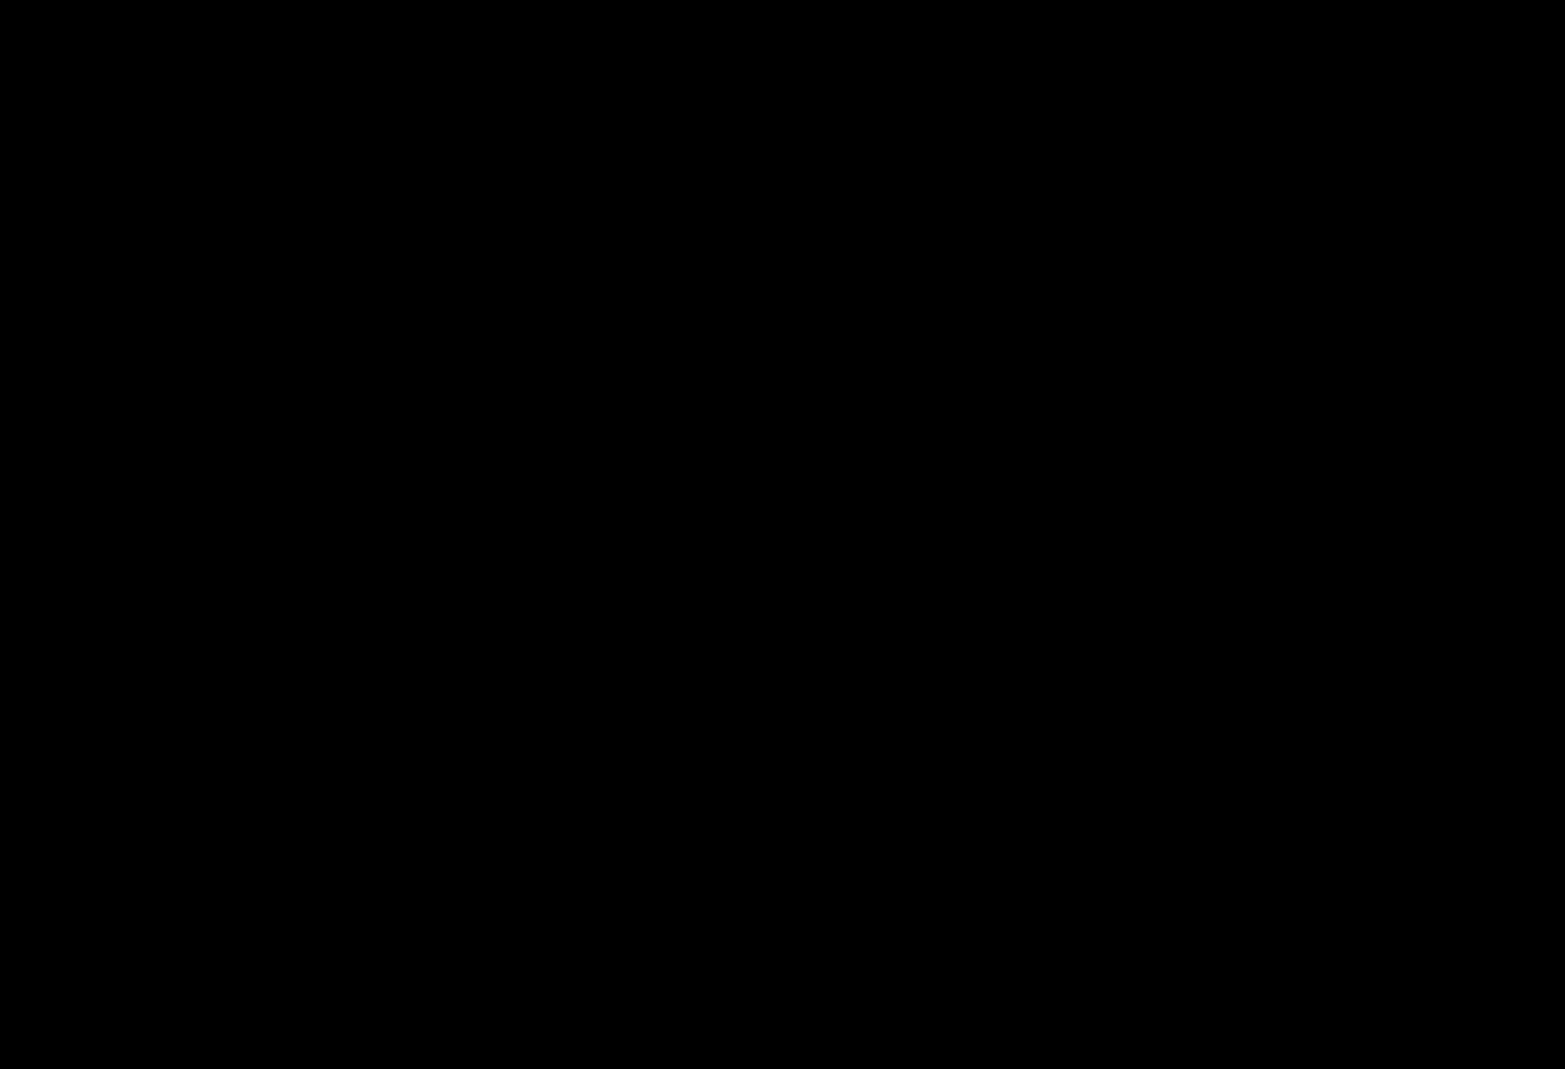 Chinese Symbol For Rage Chinese symbol for rage